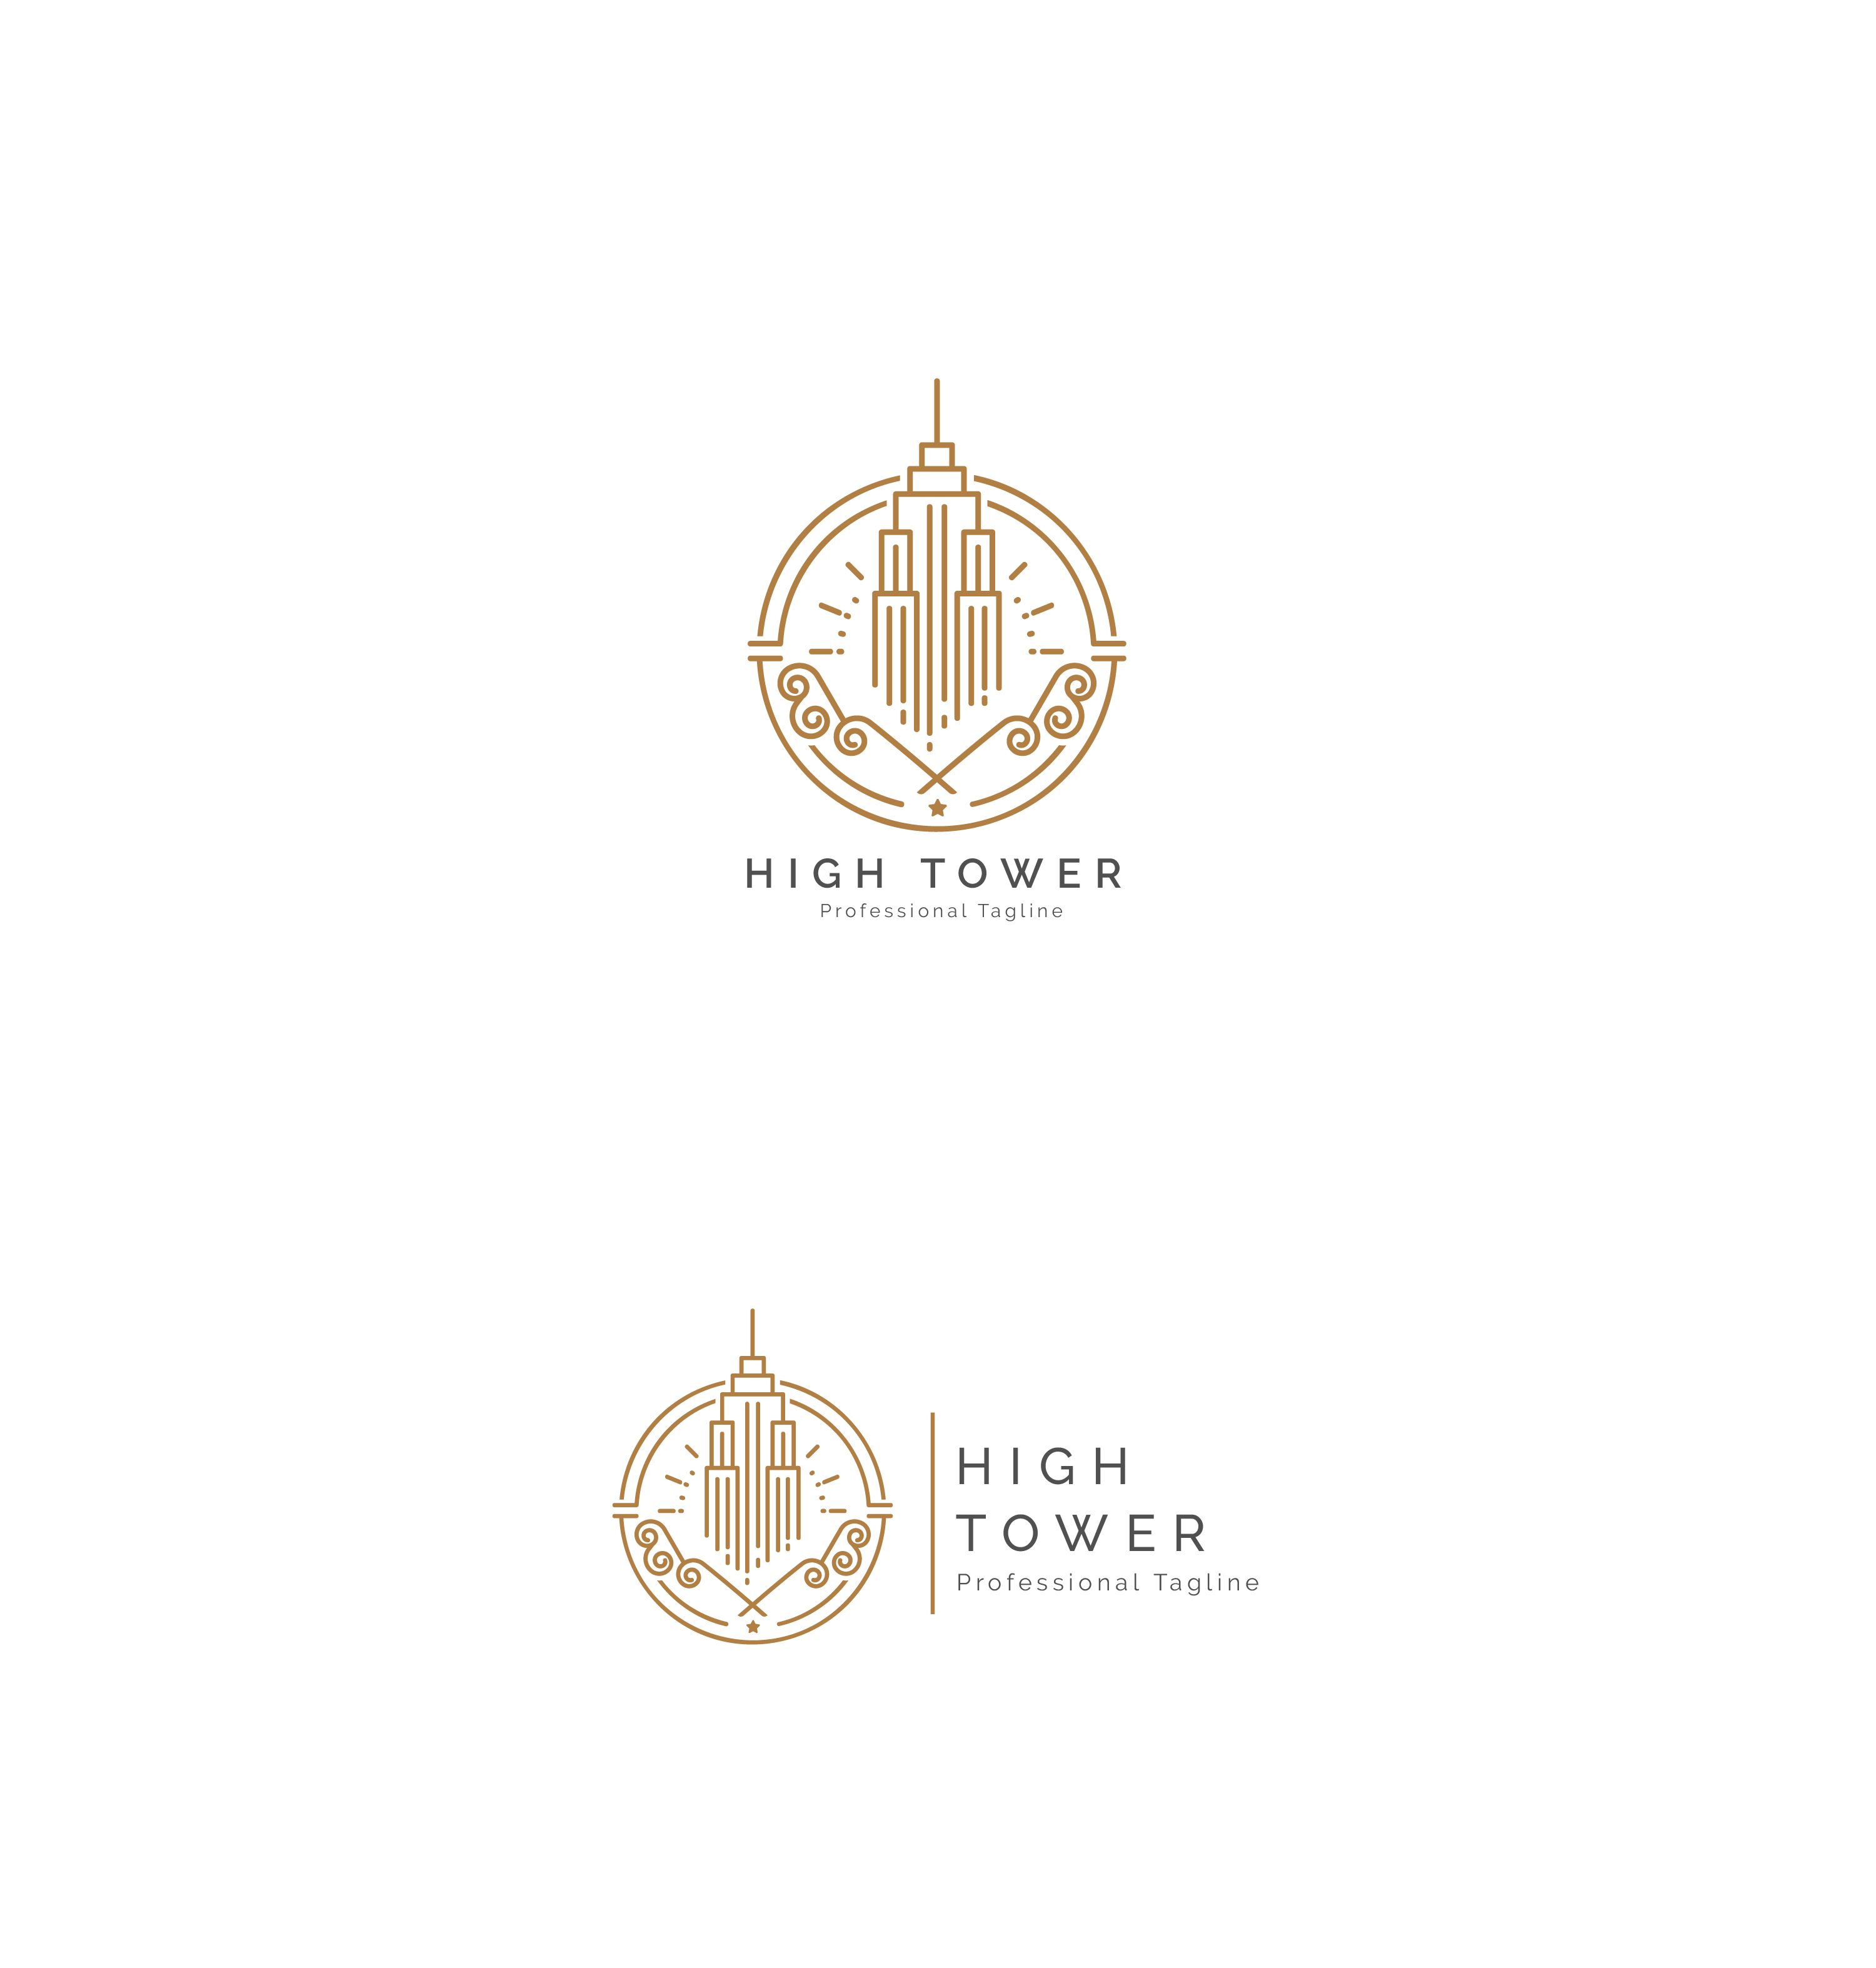 High Tower Logo - Construction Building Logo example image 3